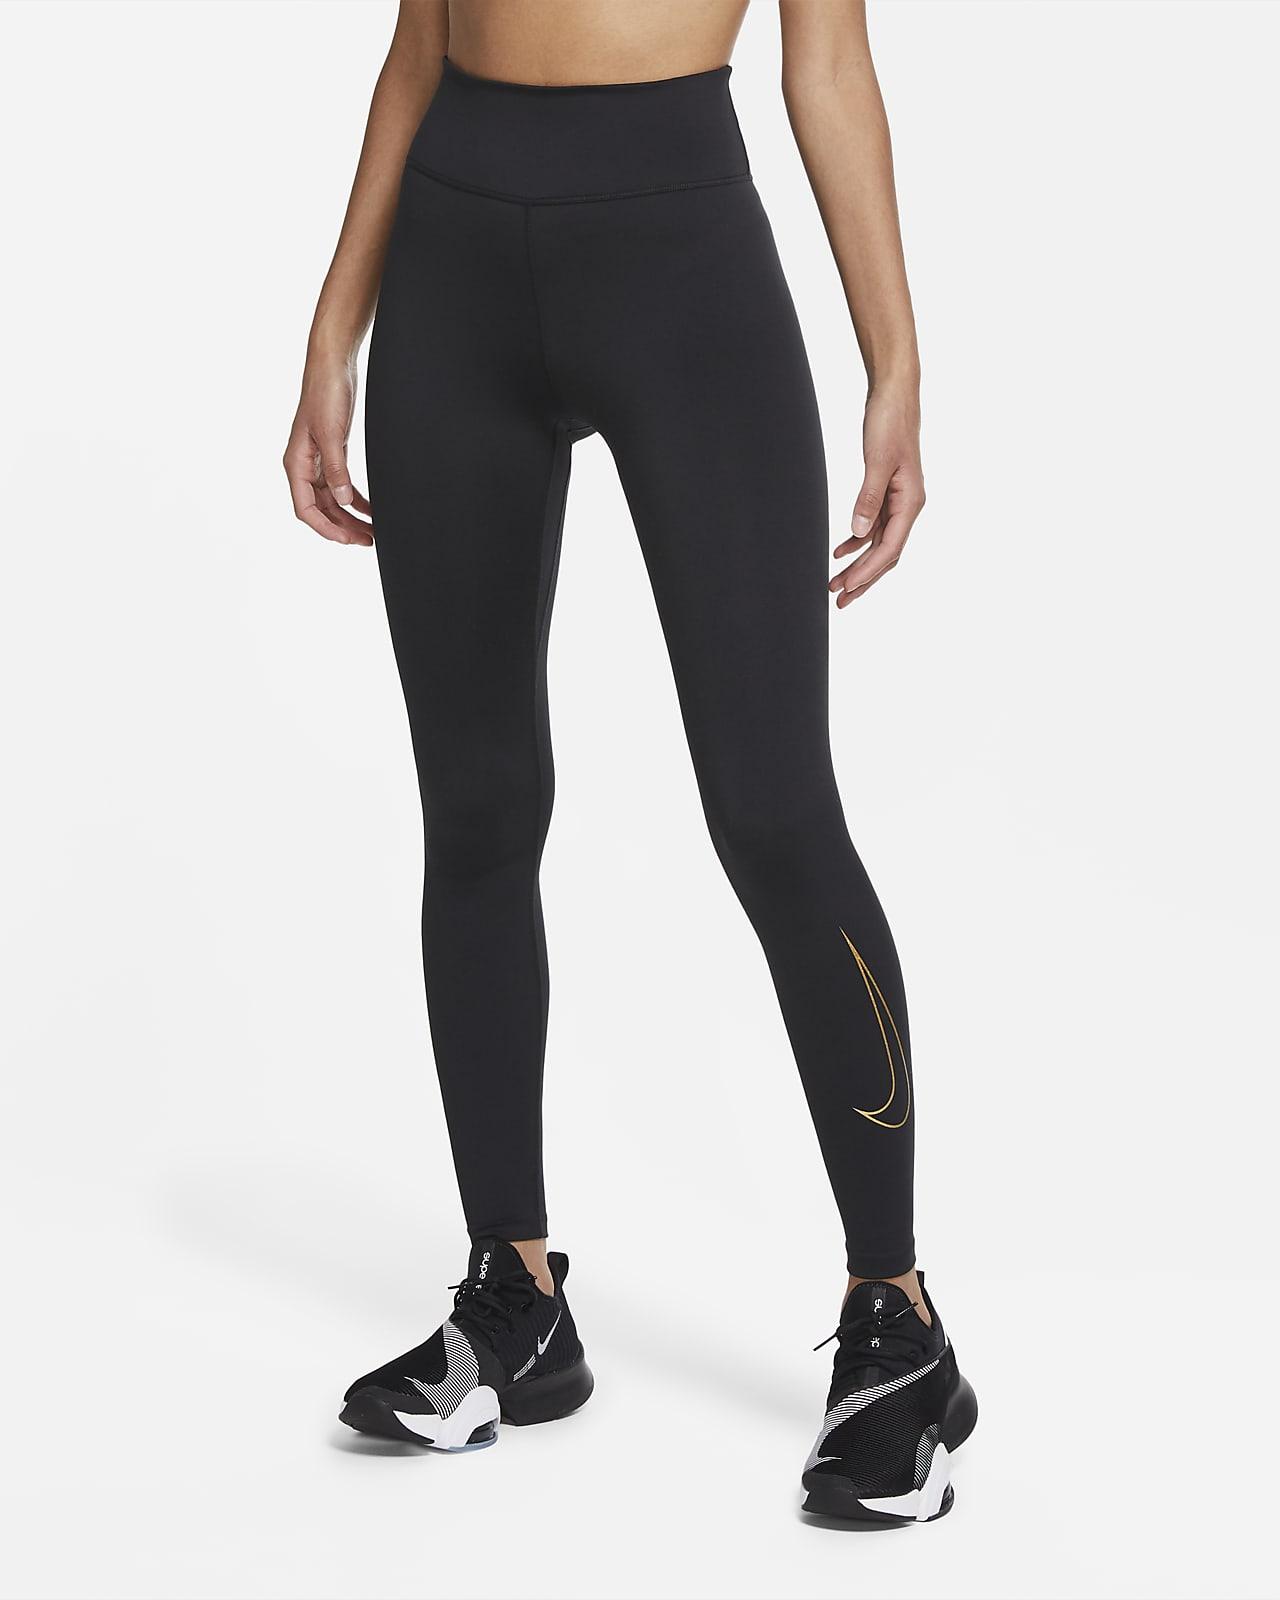 Nike One Icon Clash Women's Leggings